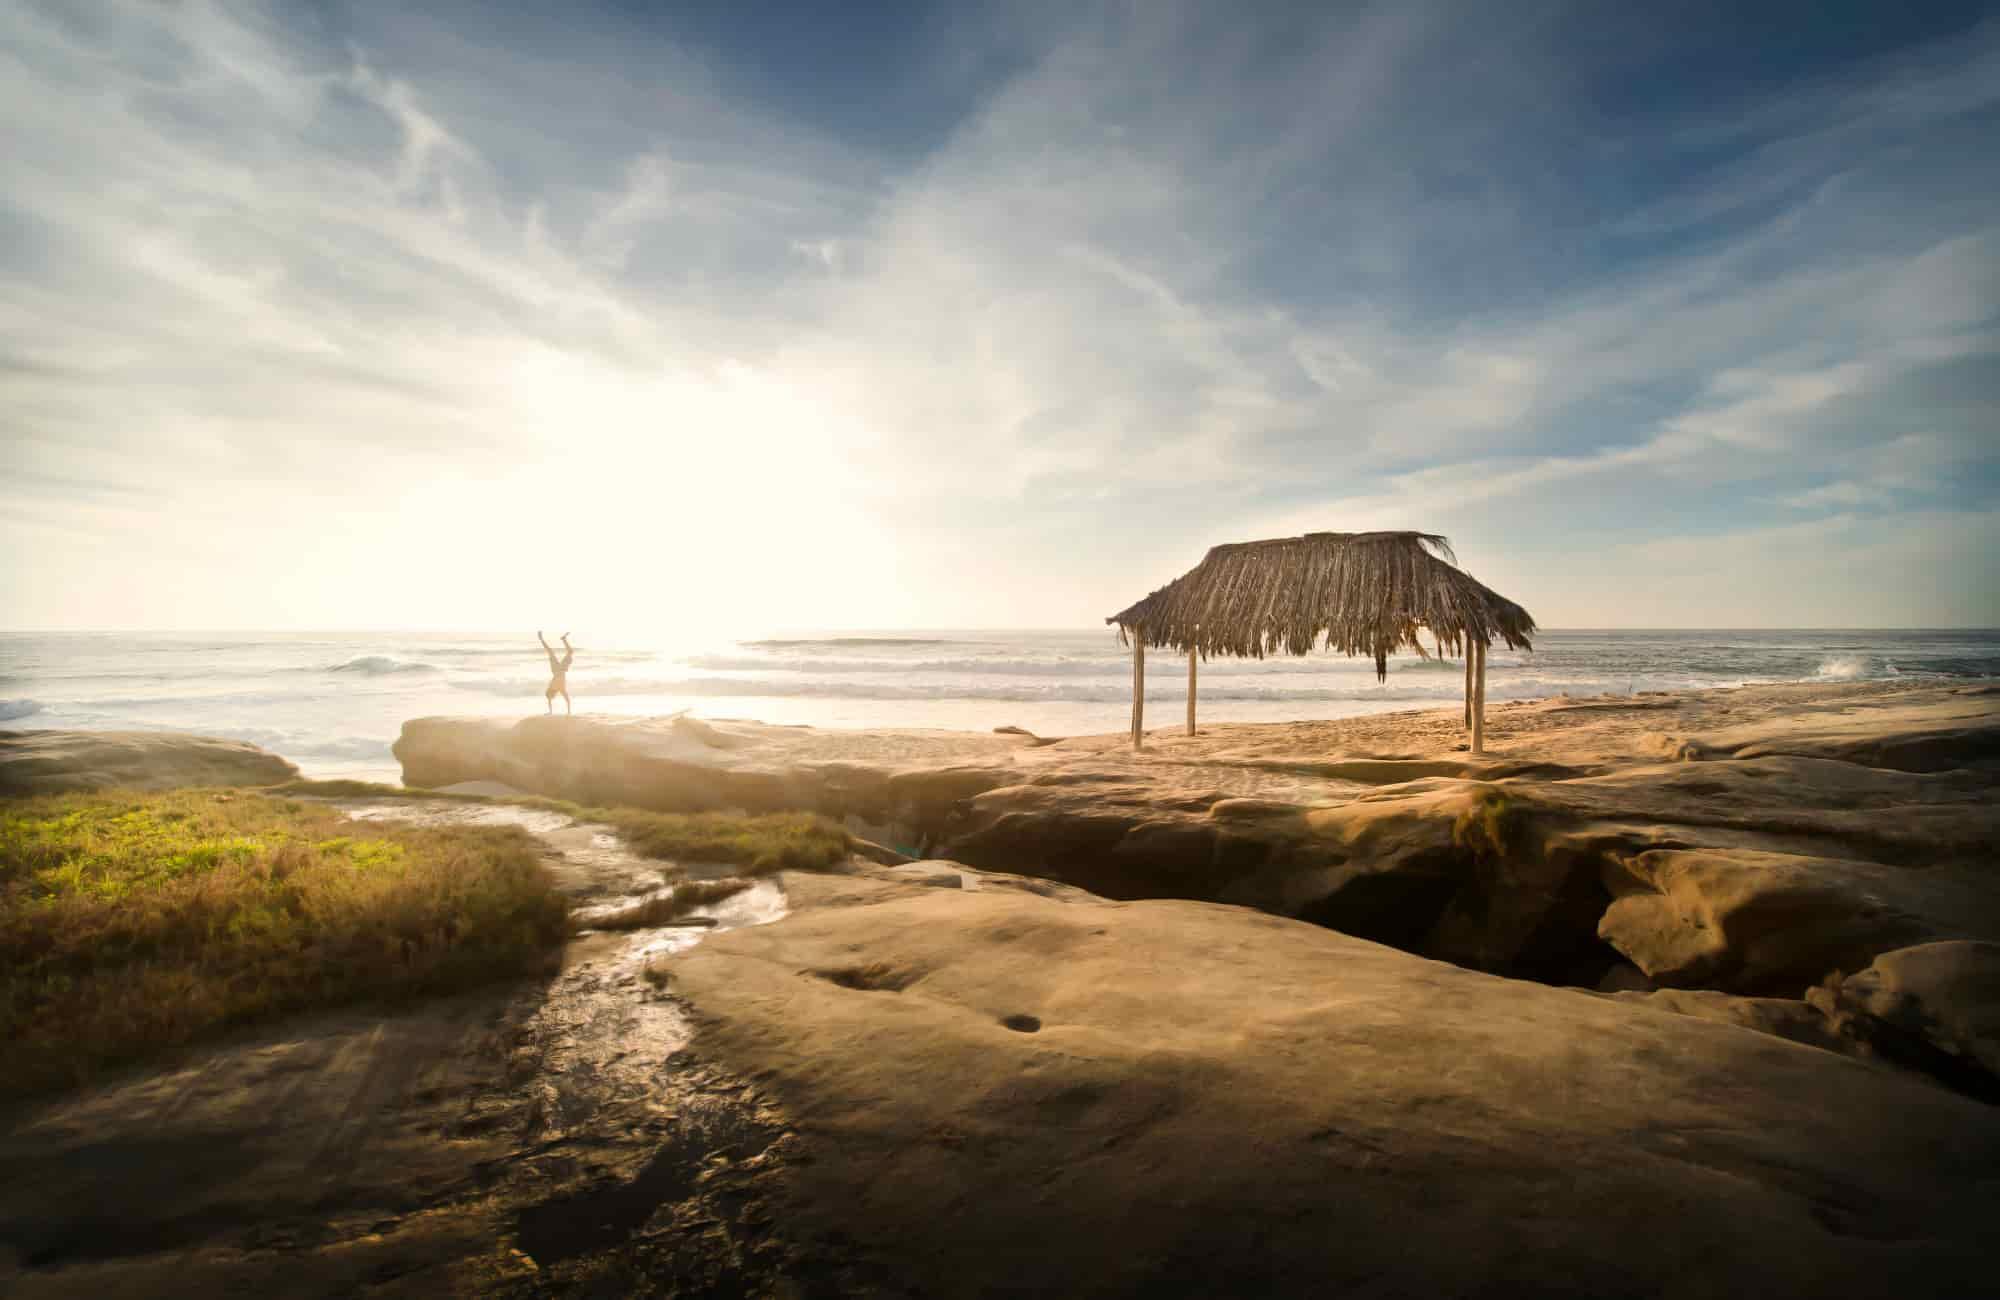 Voyage Californie - Plage de San Diego - Amplitudes